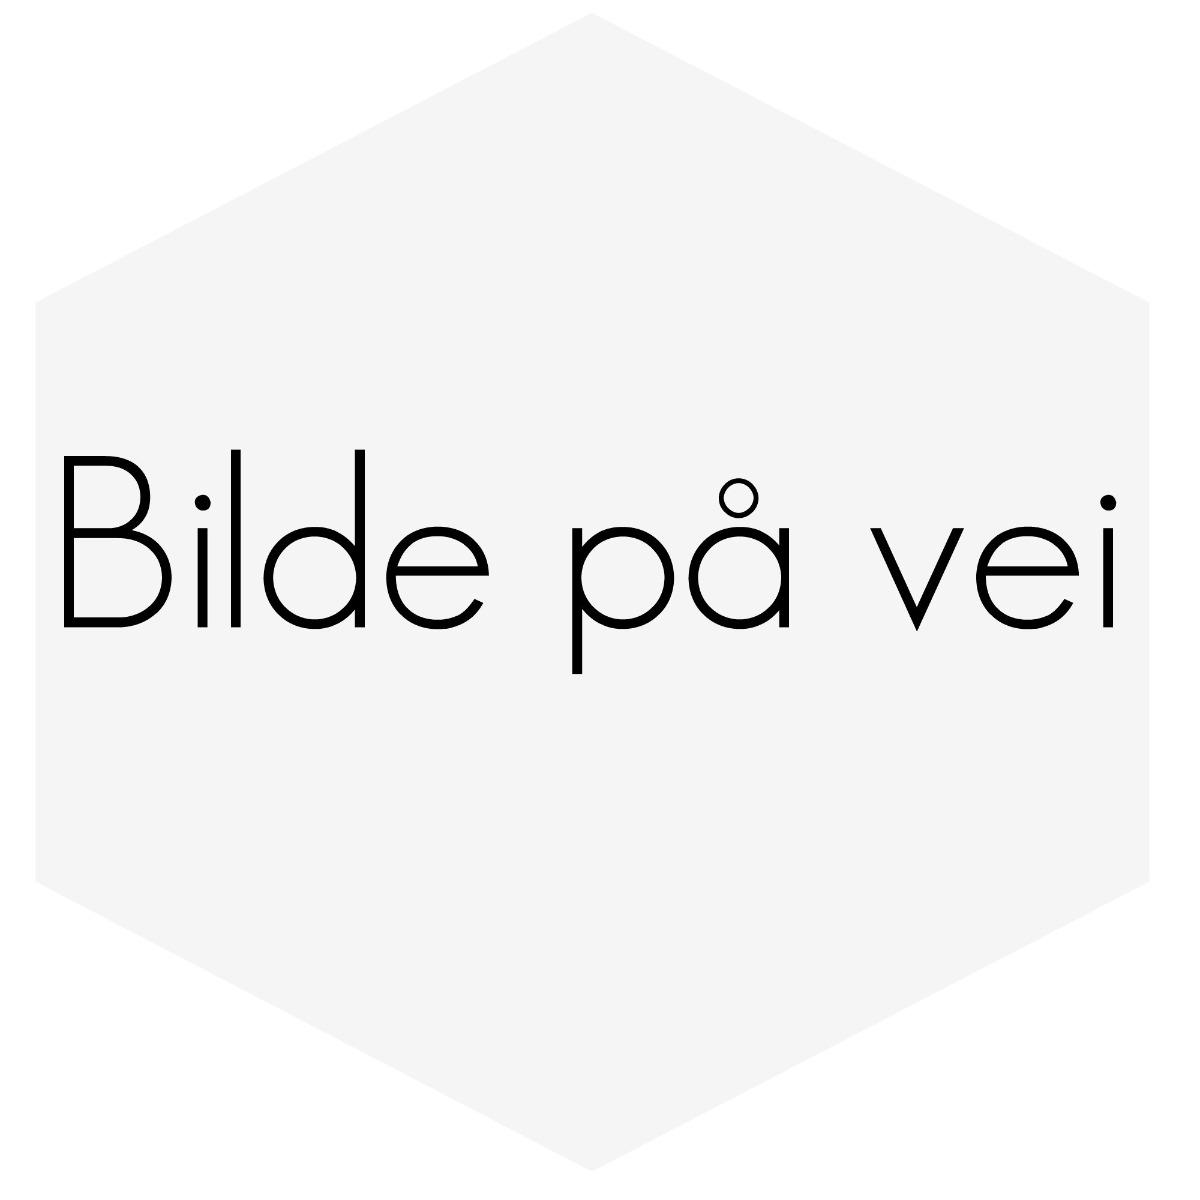 VENTILFJÆR B18/20/30 TILSVARER VOLVO'S GULMERKEDE